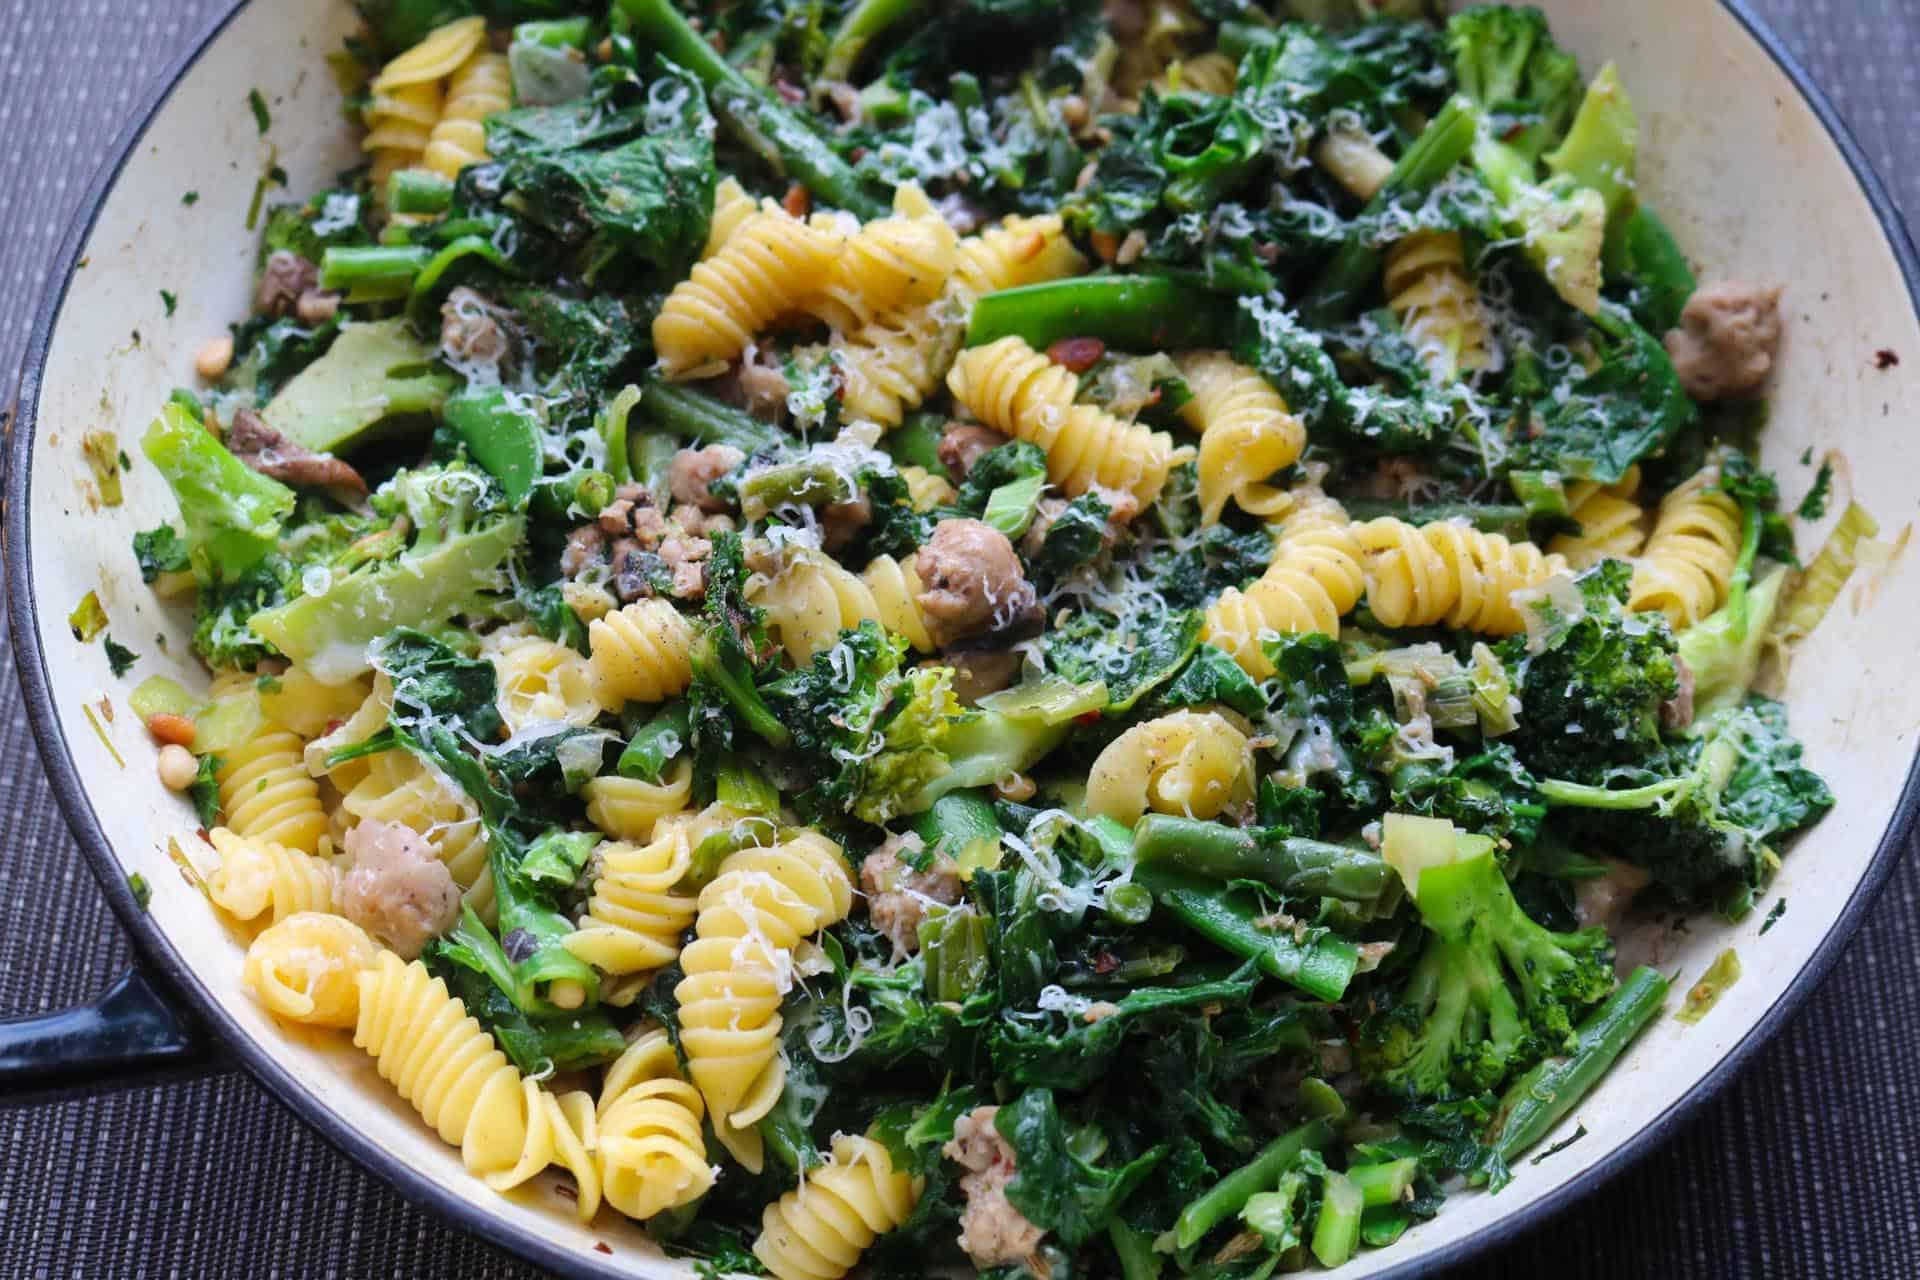 Sausage Pasta, Sausage, Vegetable and Pine Nut Pasta